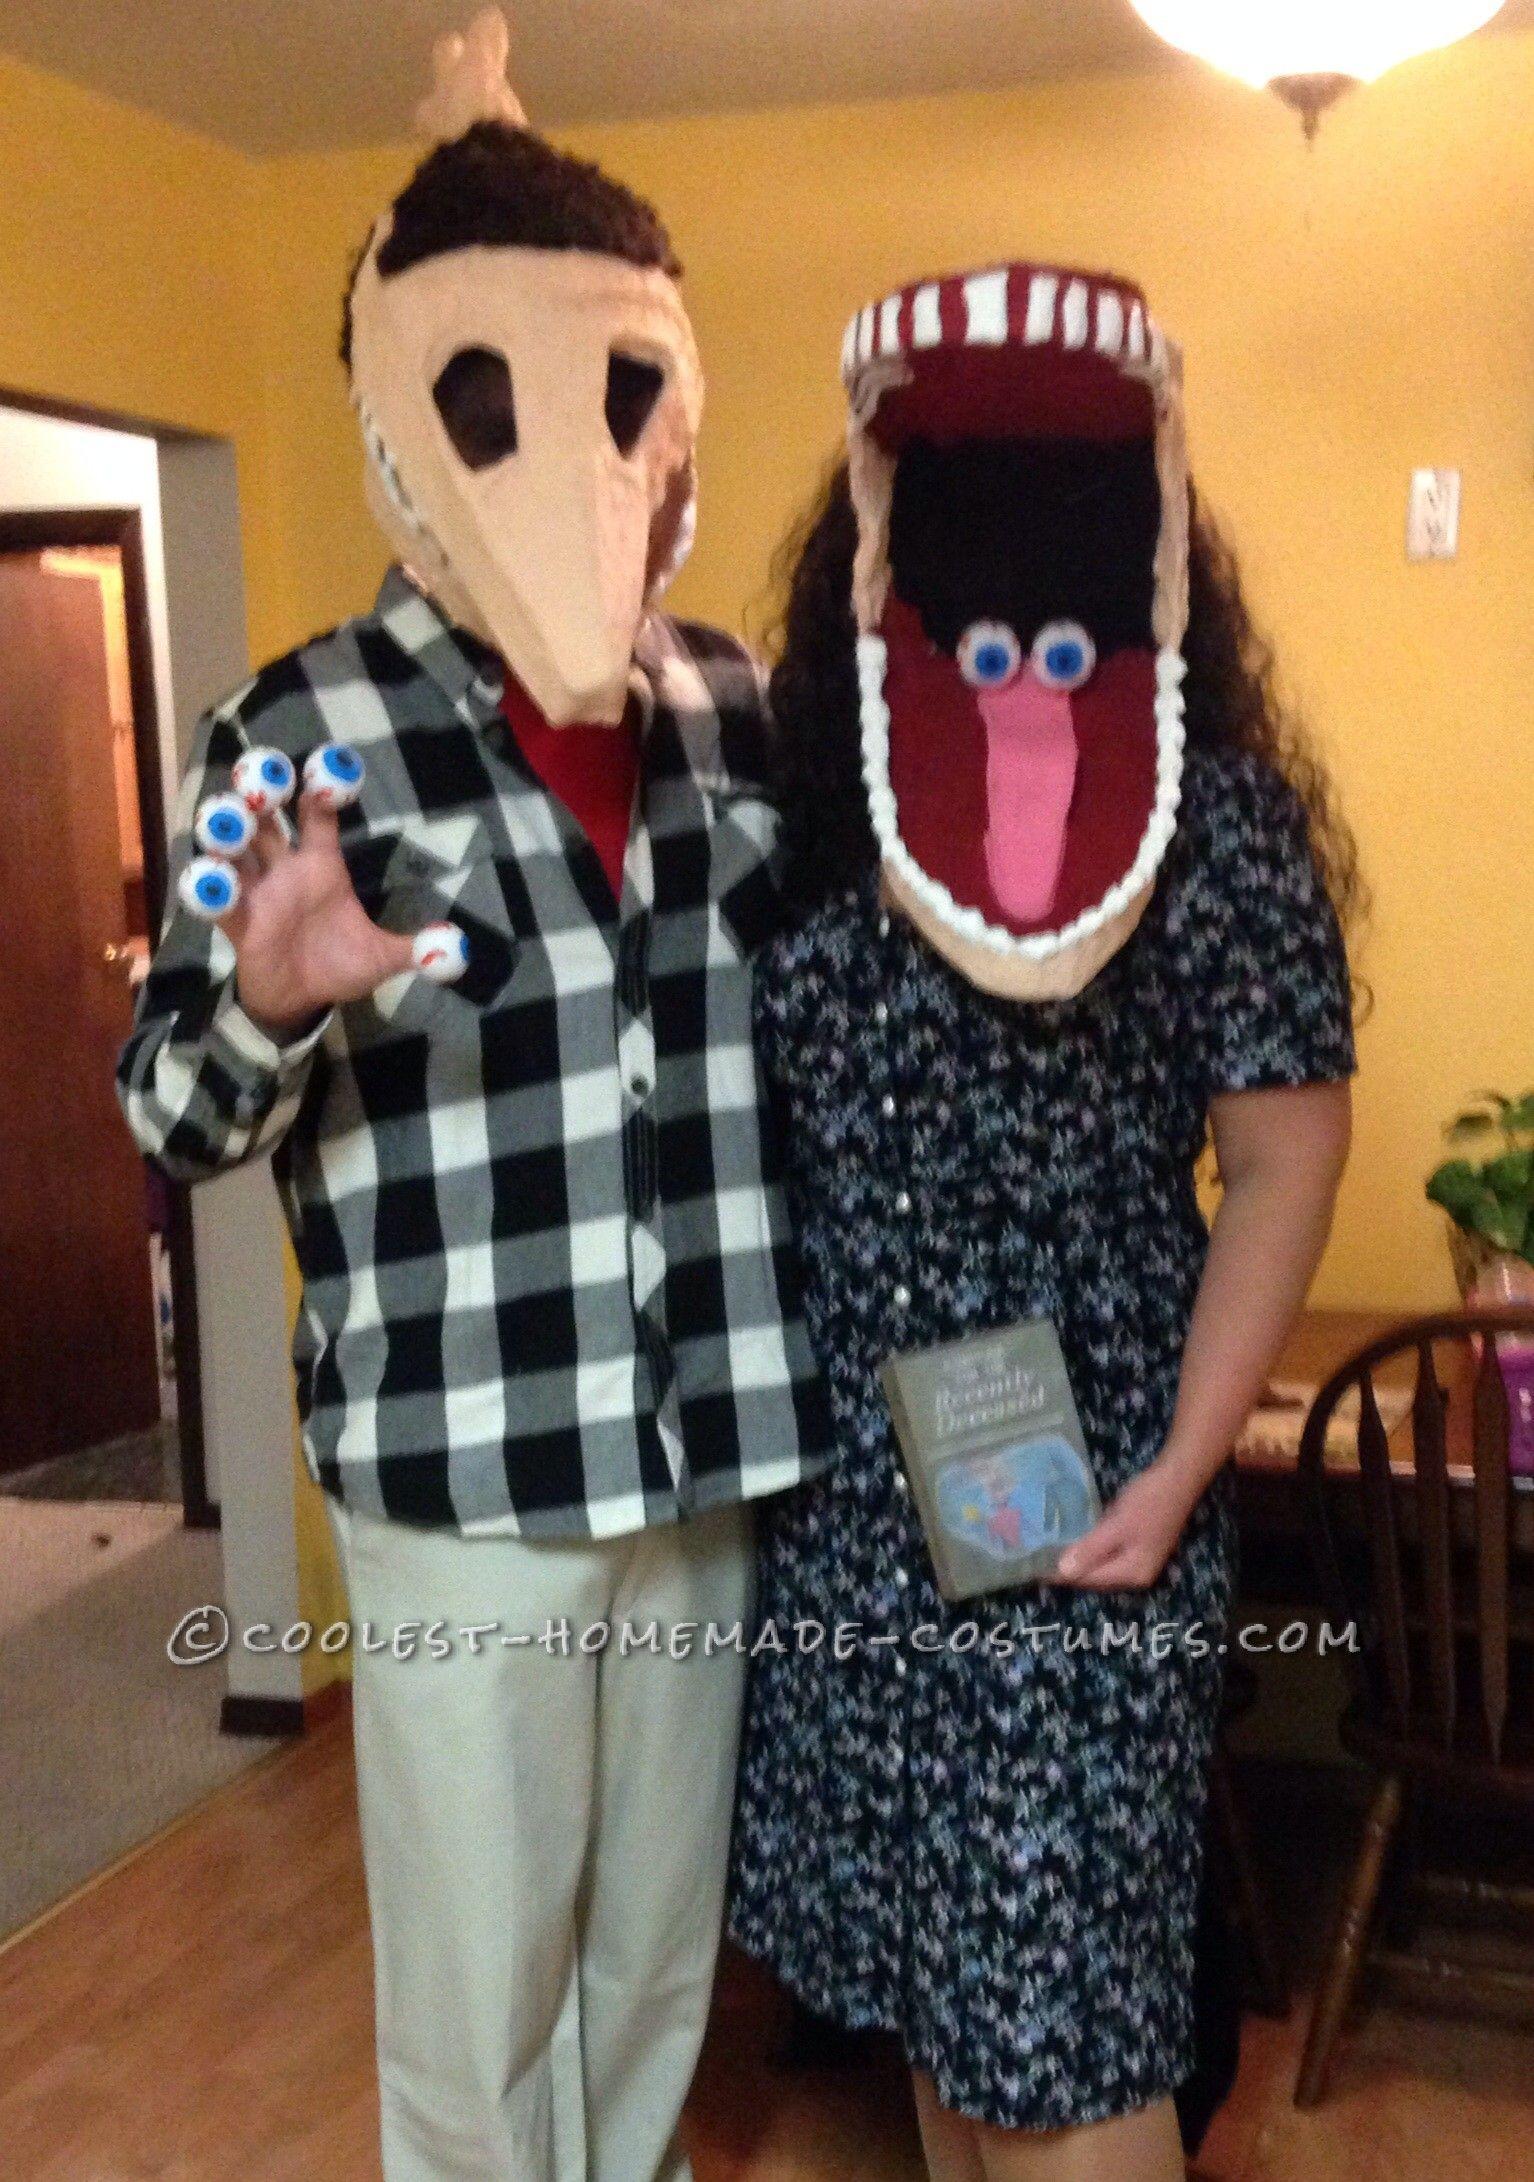 Cool Diy Adam And Barbara Maitland Couple Costume Diy Halloween Costumes Easy Halloween Costumes You Can Make Diy Halloween Costumes